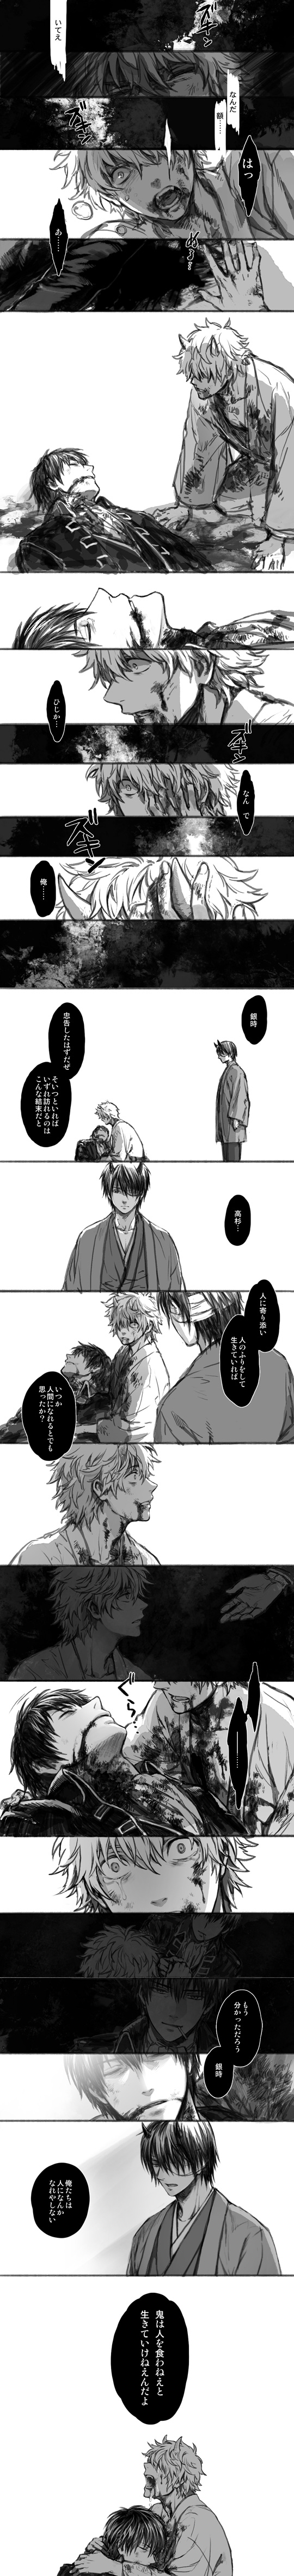 Tags: Anime, Tkr (Lovedelic99), Gintama, Sakata Gintoki, Shiroyasha, Hijikata Toushirou, Takasugi Shinsuke, Sad Comic, Comic, Translation Request, GinHiji, Silver Soul